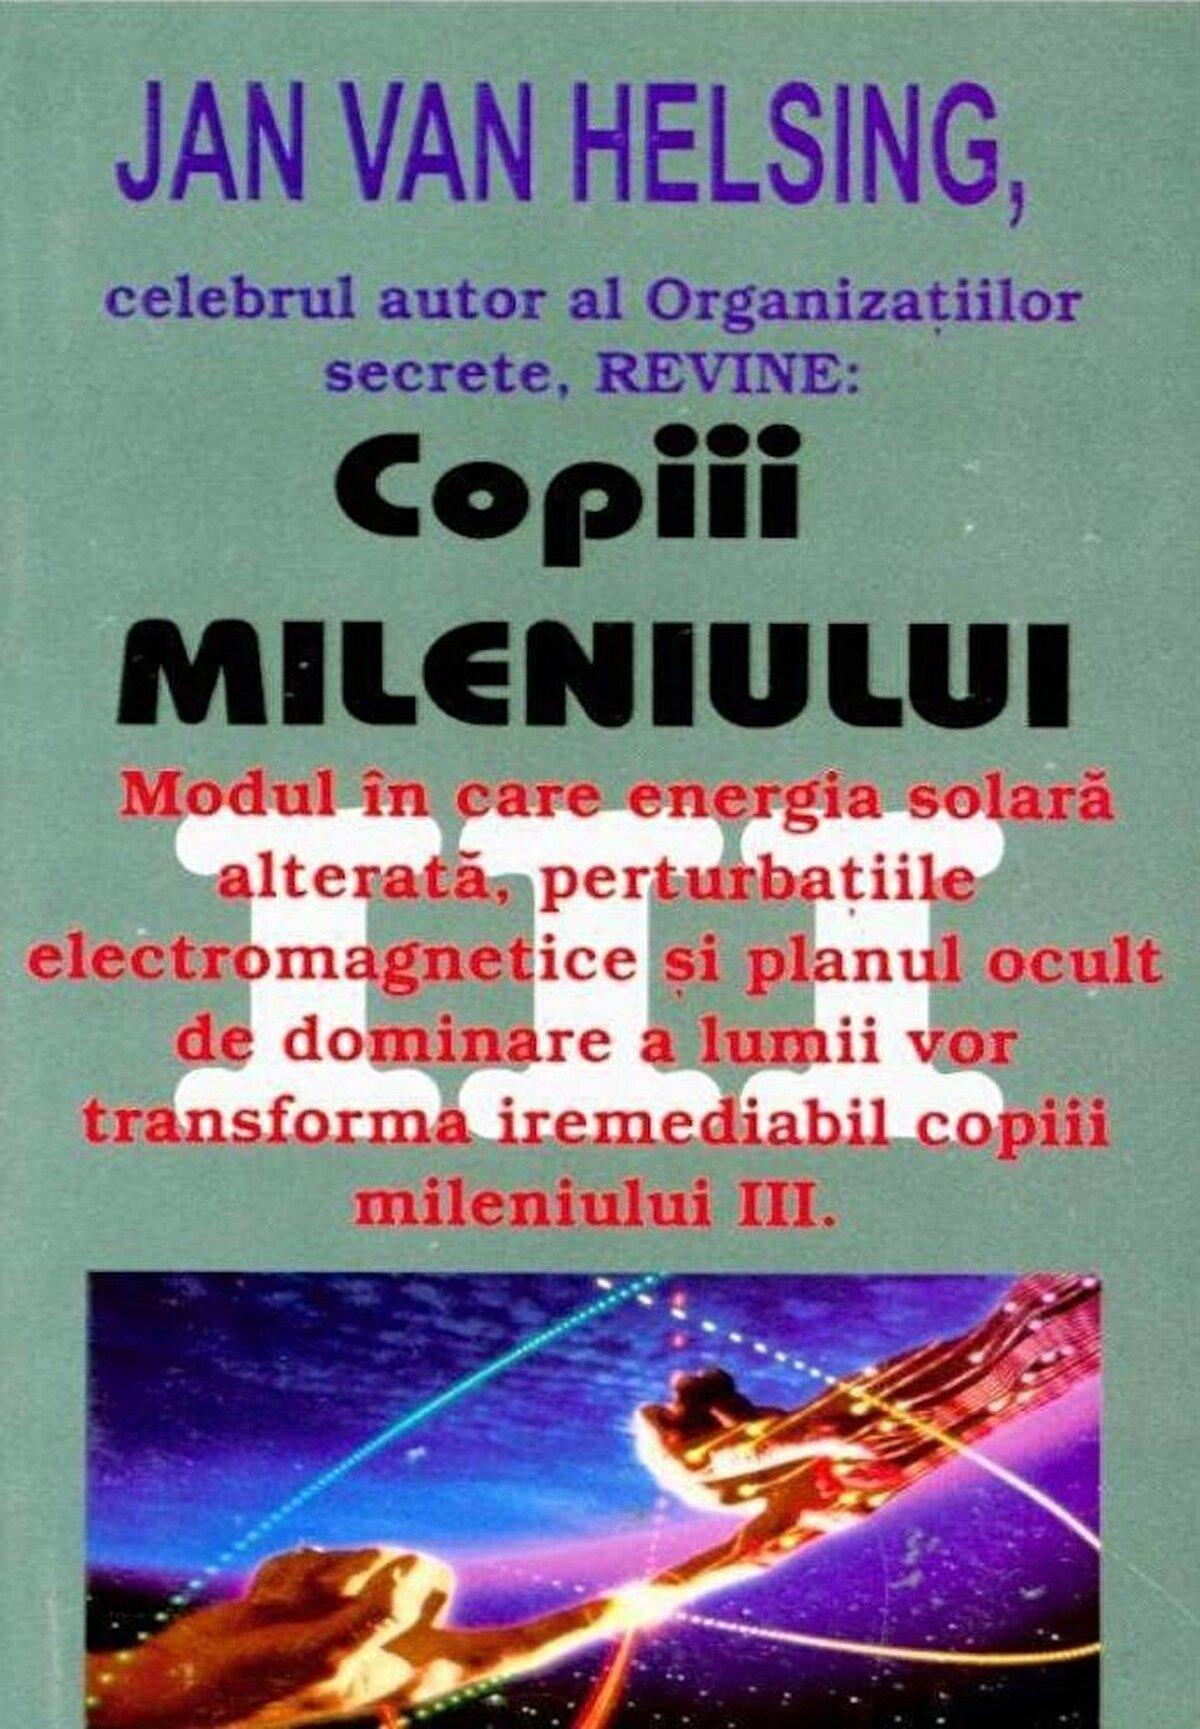 Copiii mileniului III